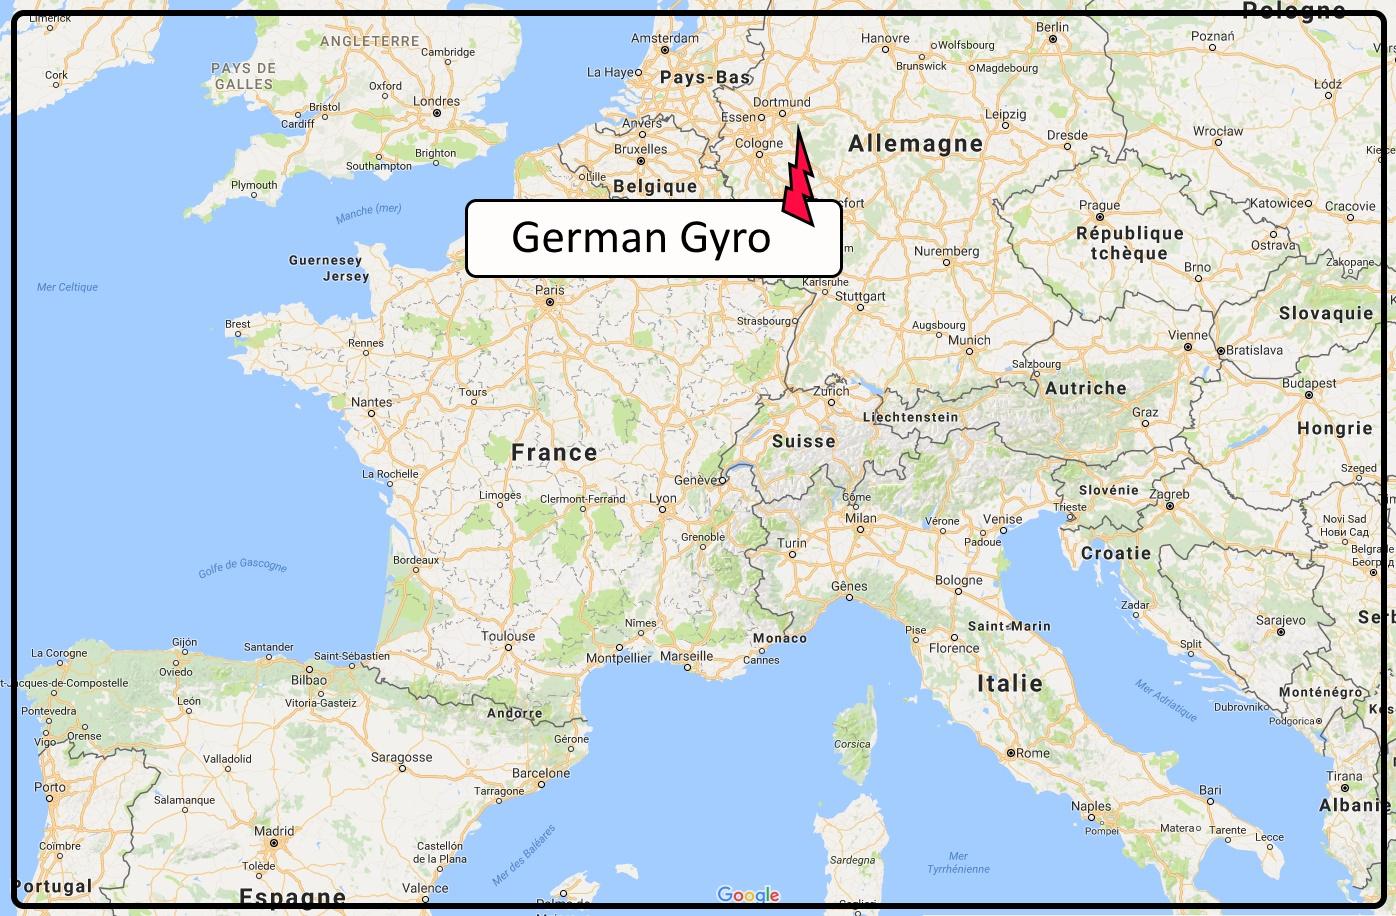 German gyro